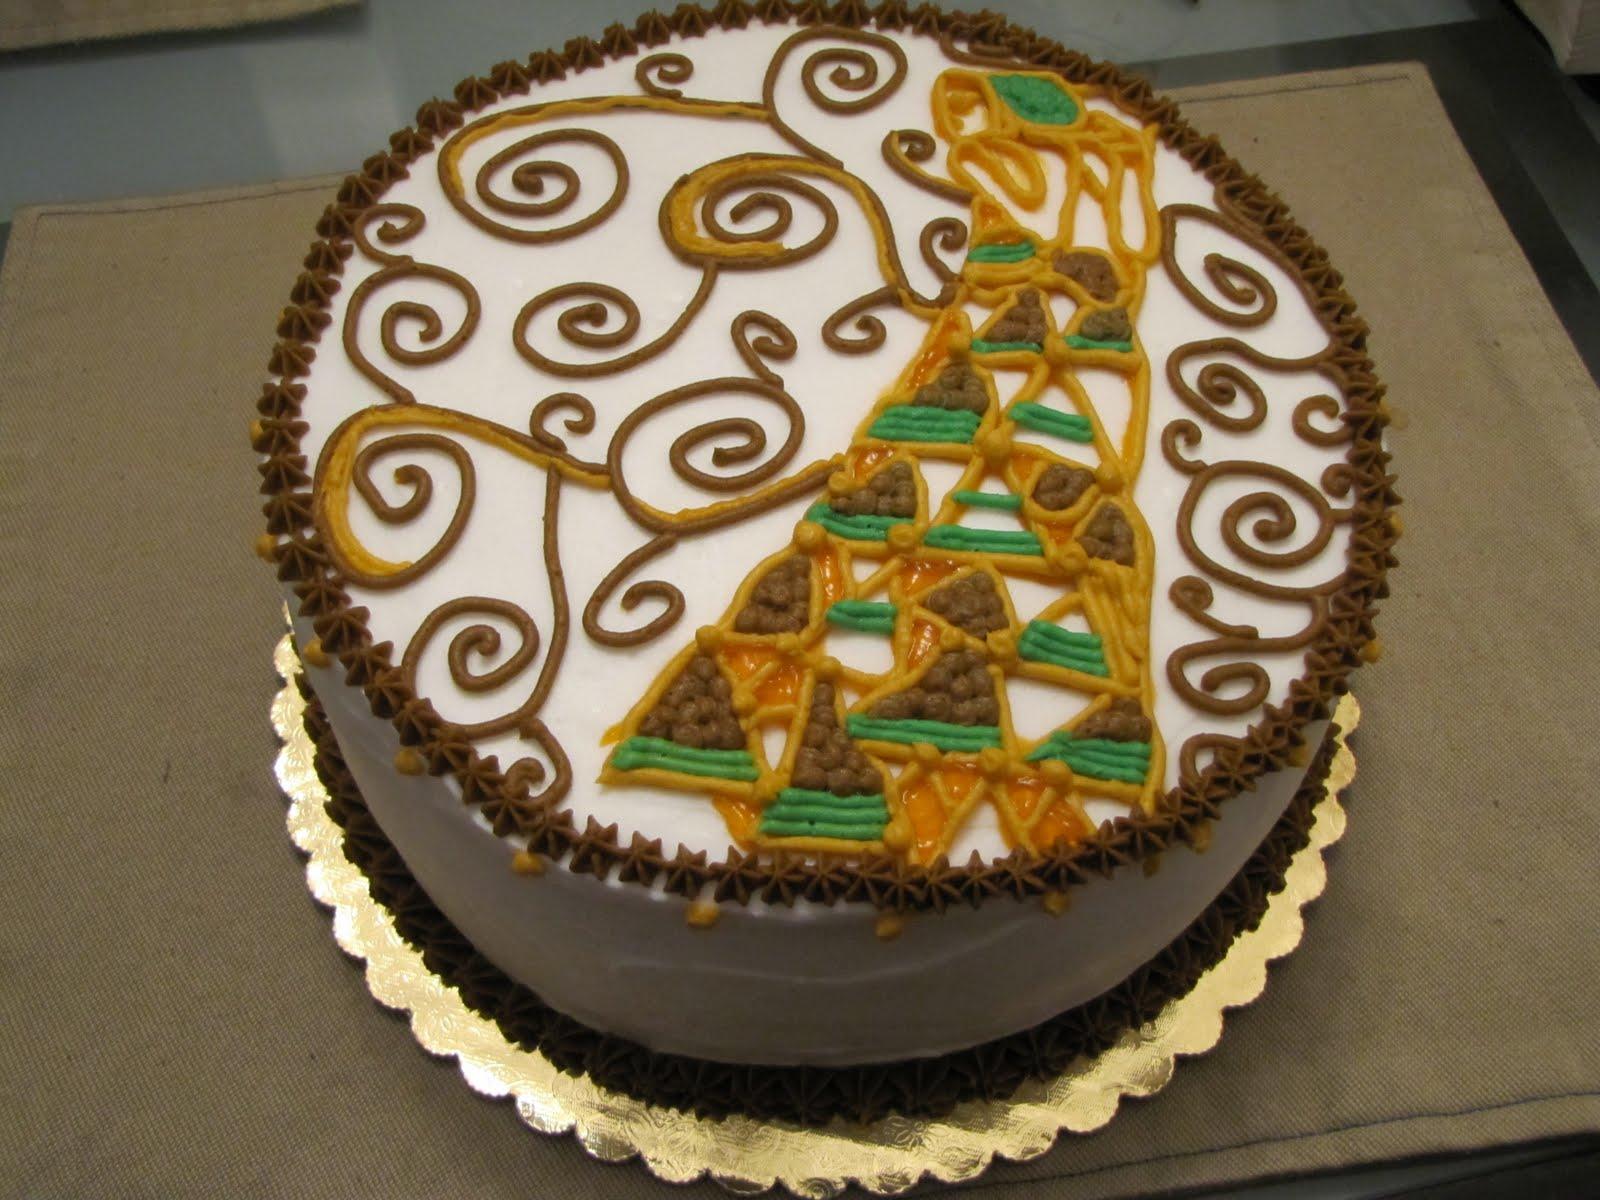 Cake Artist Meaning : Art Inspired Cake newhairstylesformen2014.com